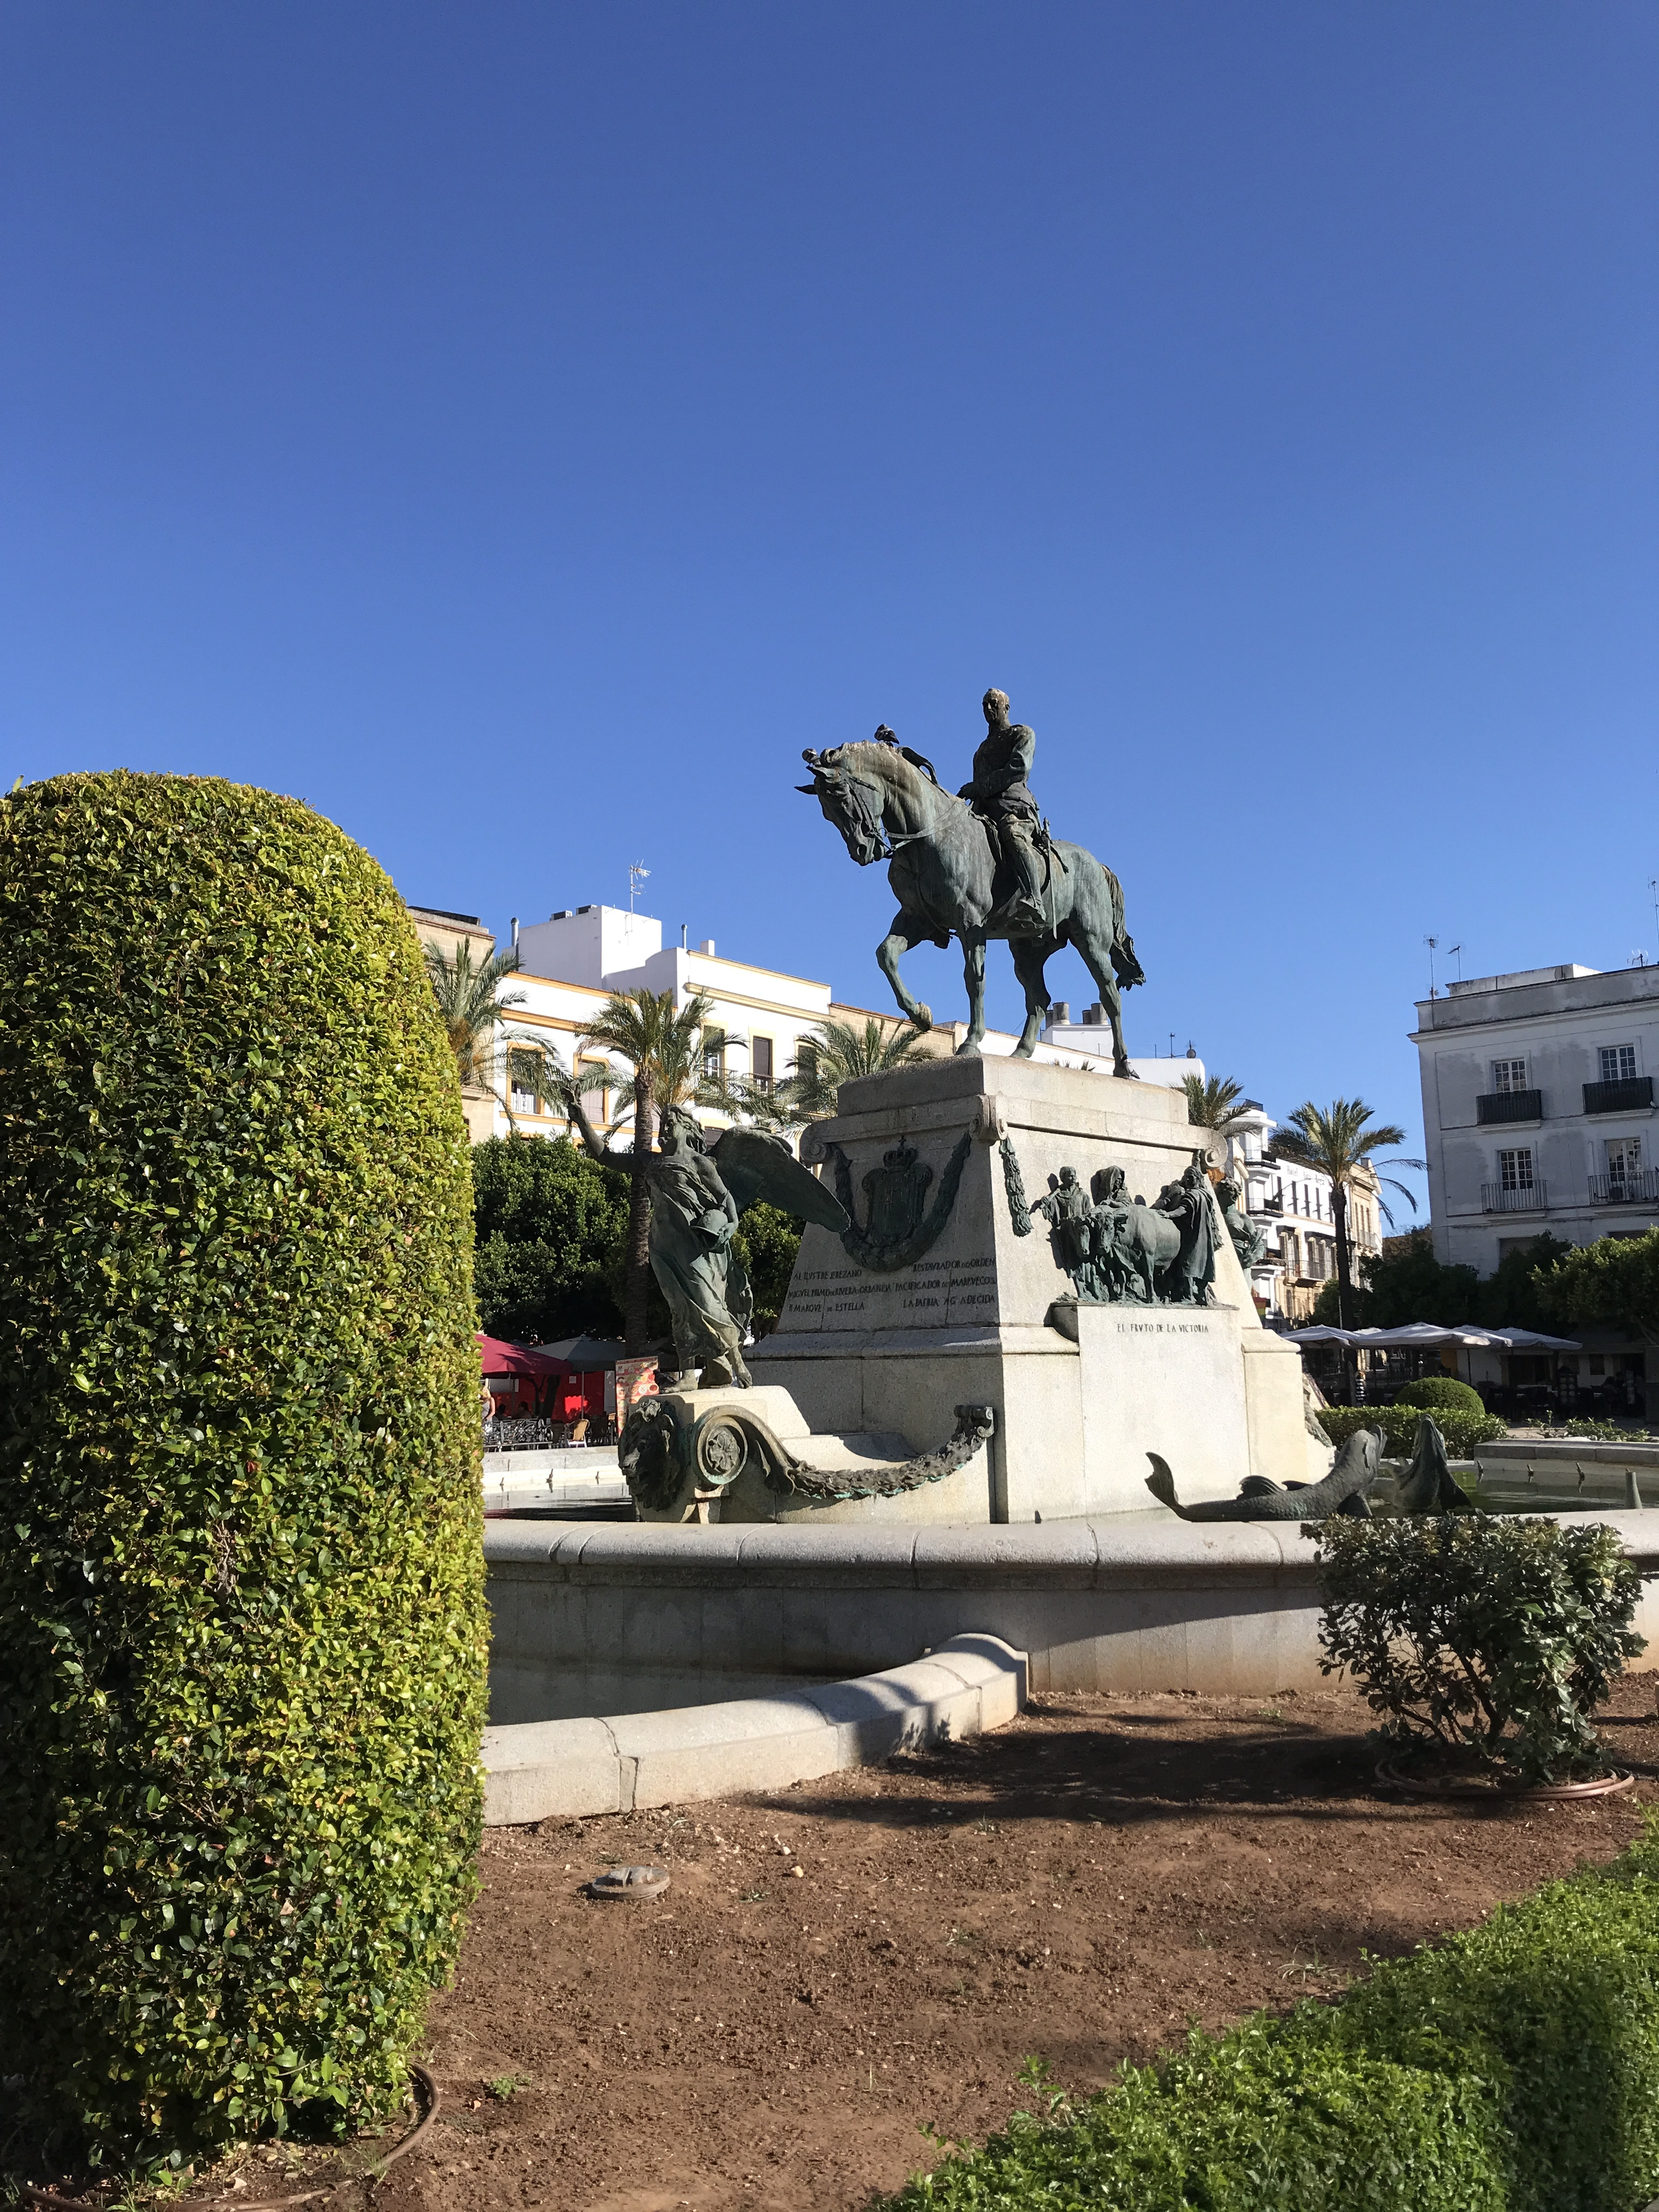 Plaza del CaballoJerez de la Frontera